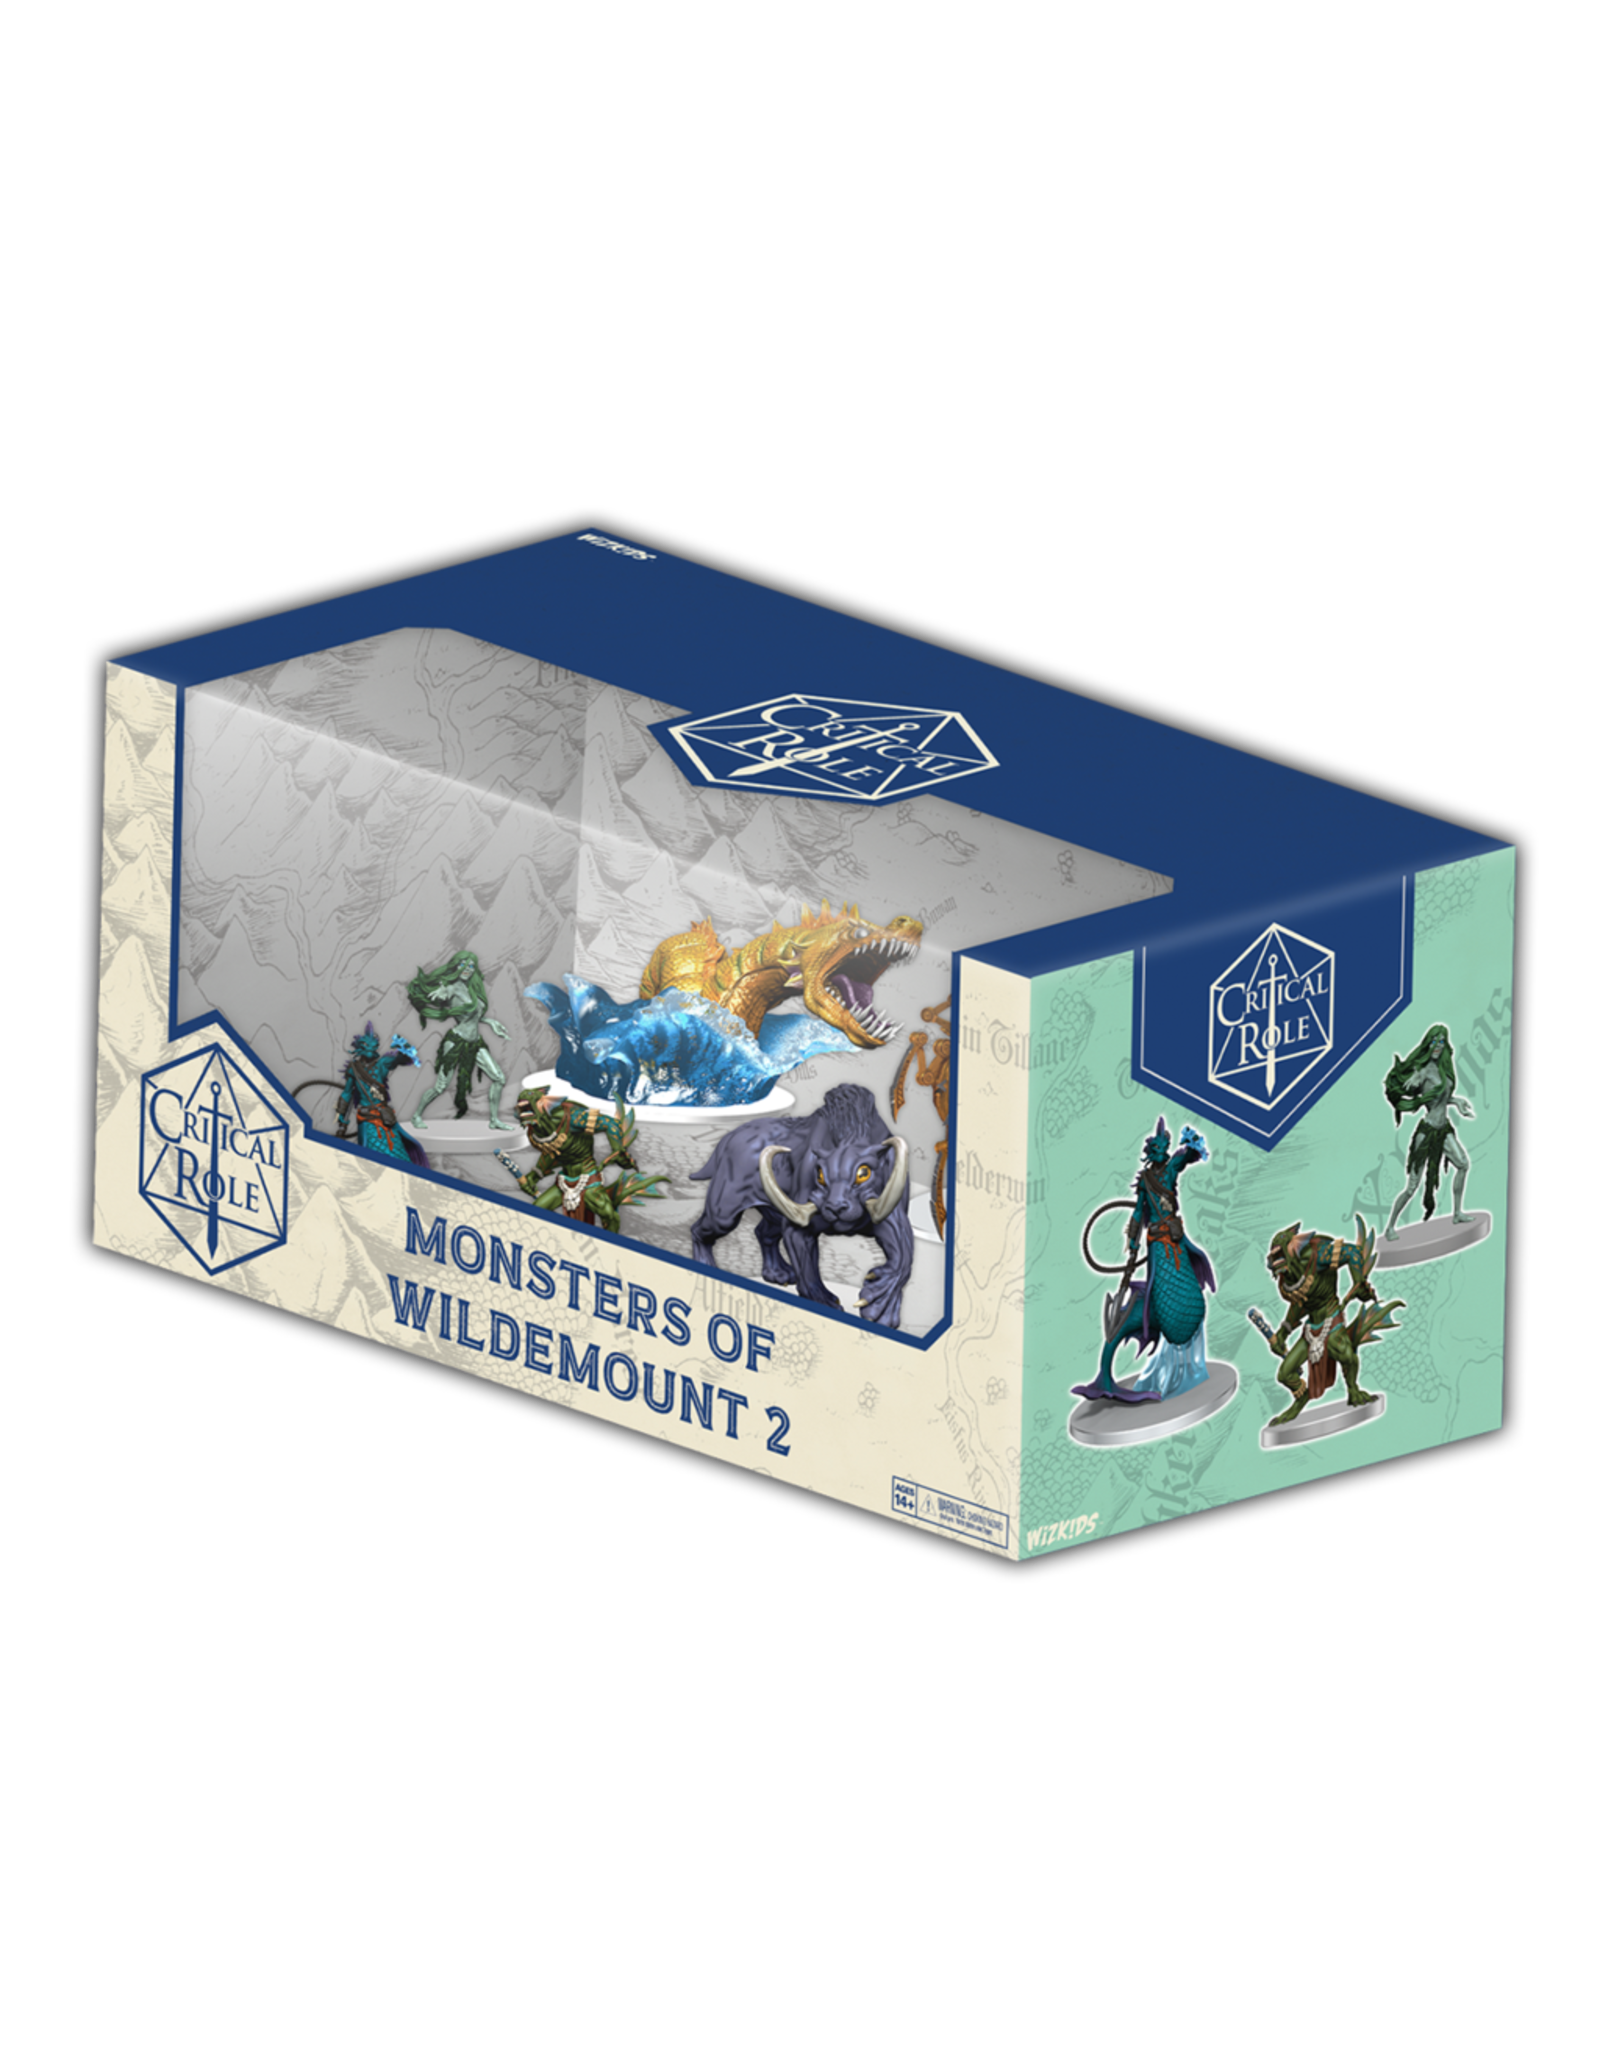 Wiz Kids Critical Role: Monsters of Wildemount 2 Box Set